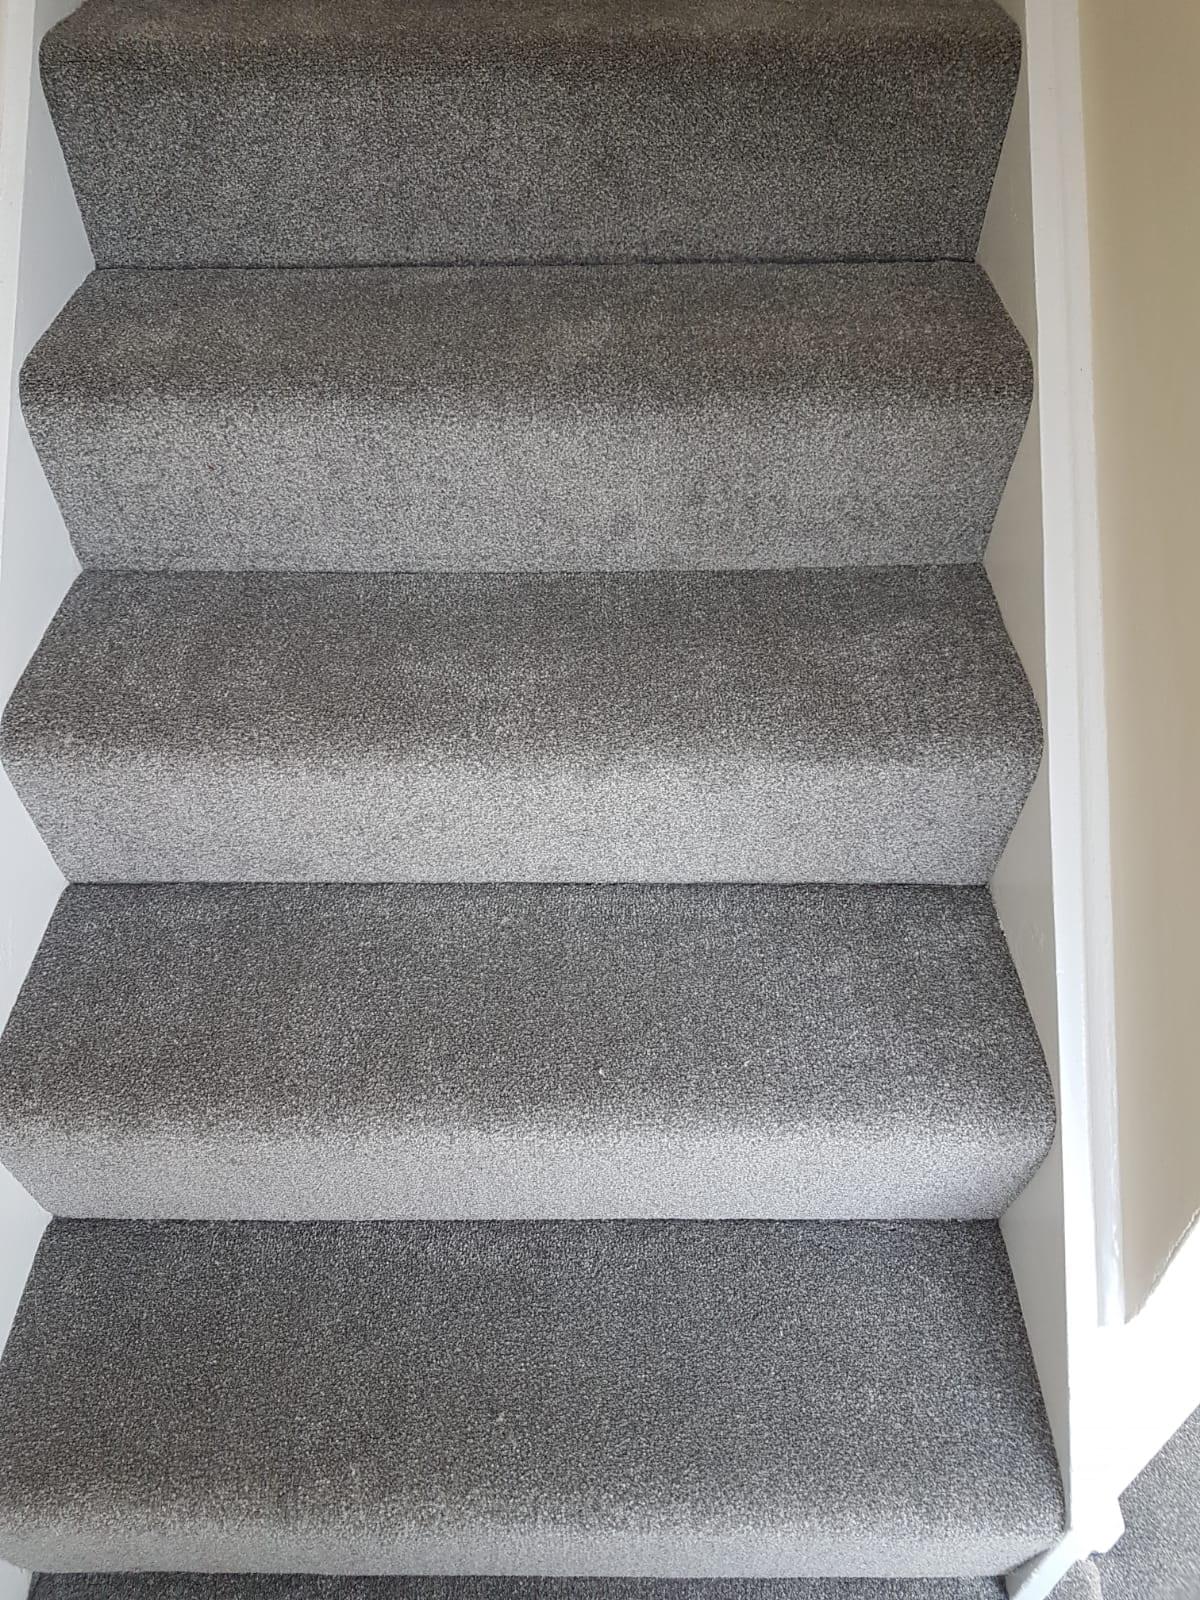 Windsor Supreme Grey Carpet Installed In Broxbourne Herts Carpets